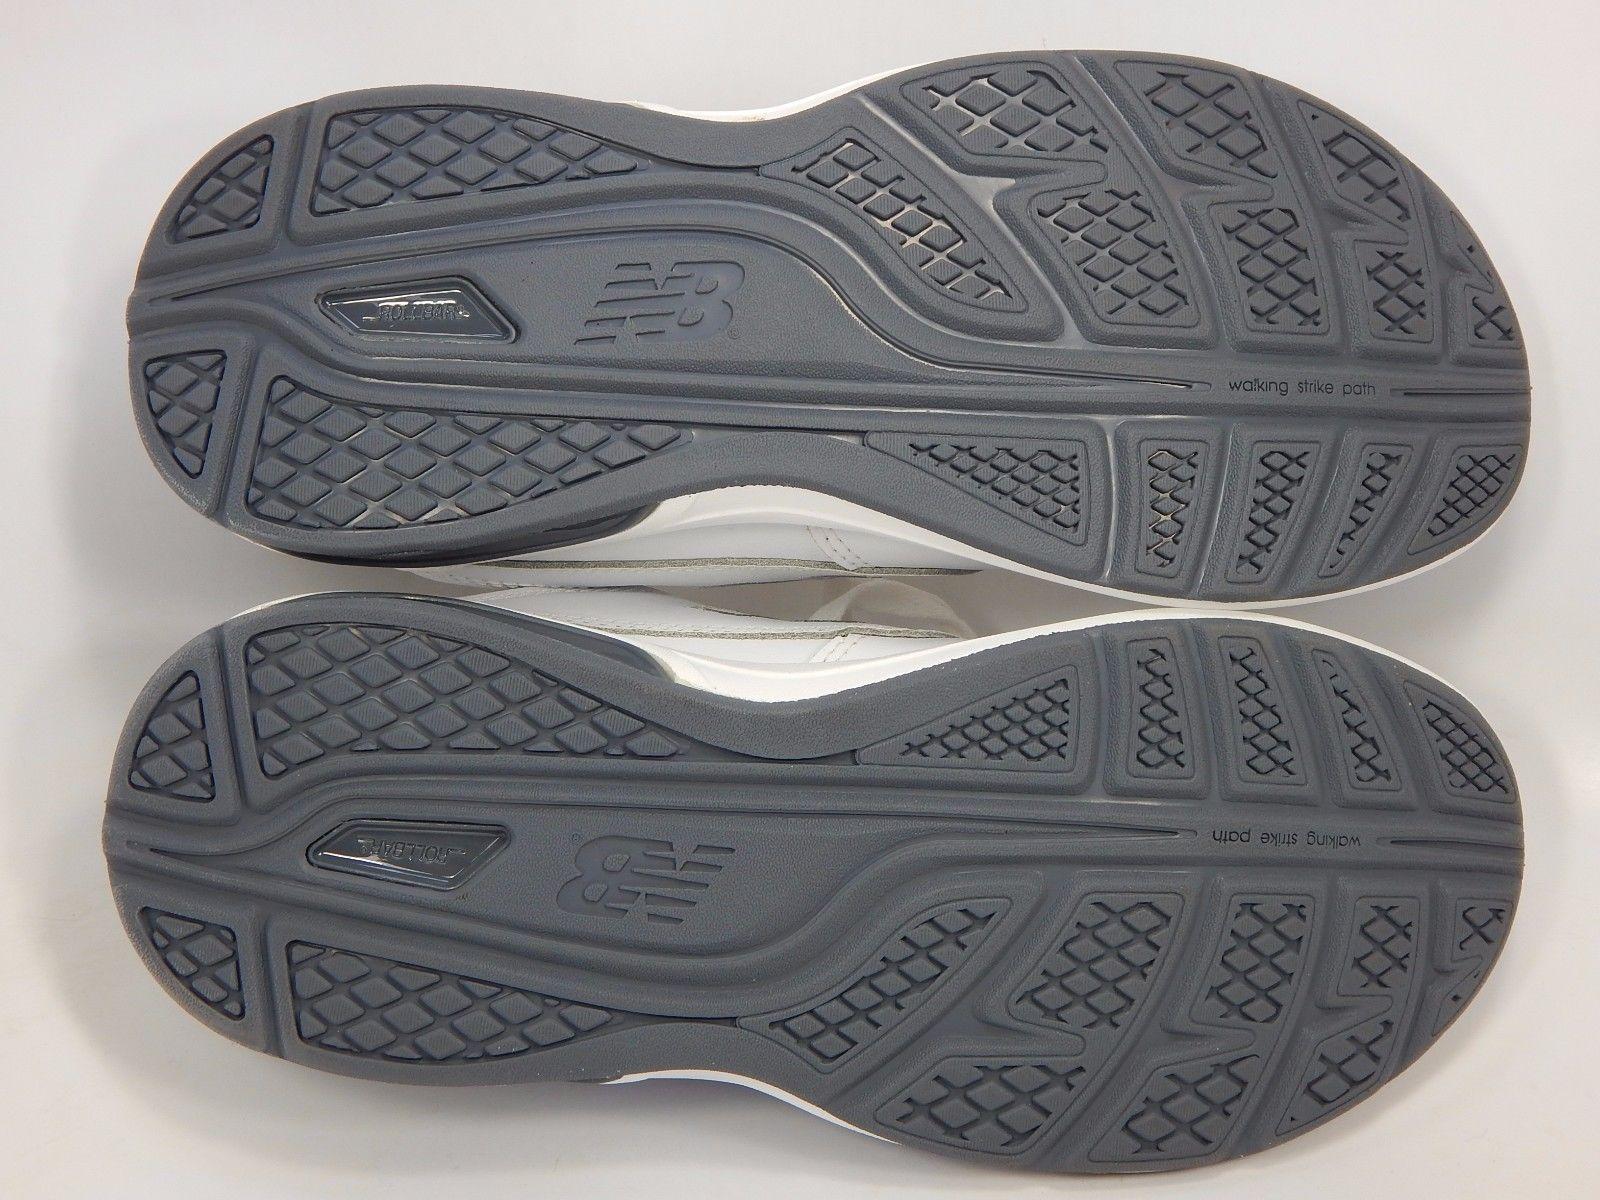 New Balance 813 Men's Walking Shoes Size US 7.5 2E WIDE EU 40.5 MW813WT